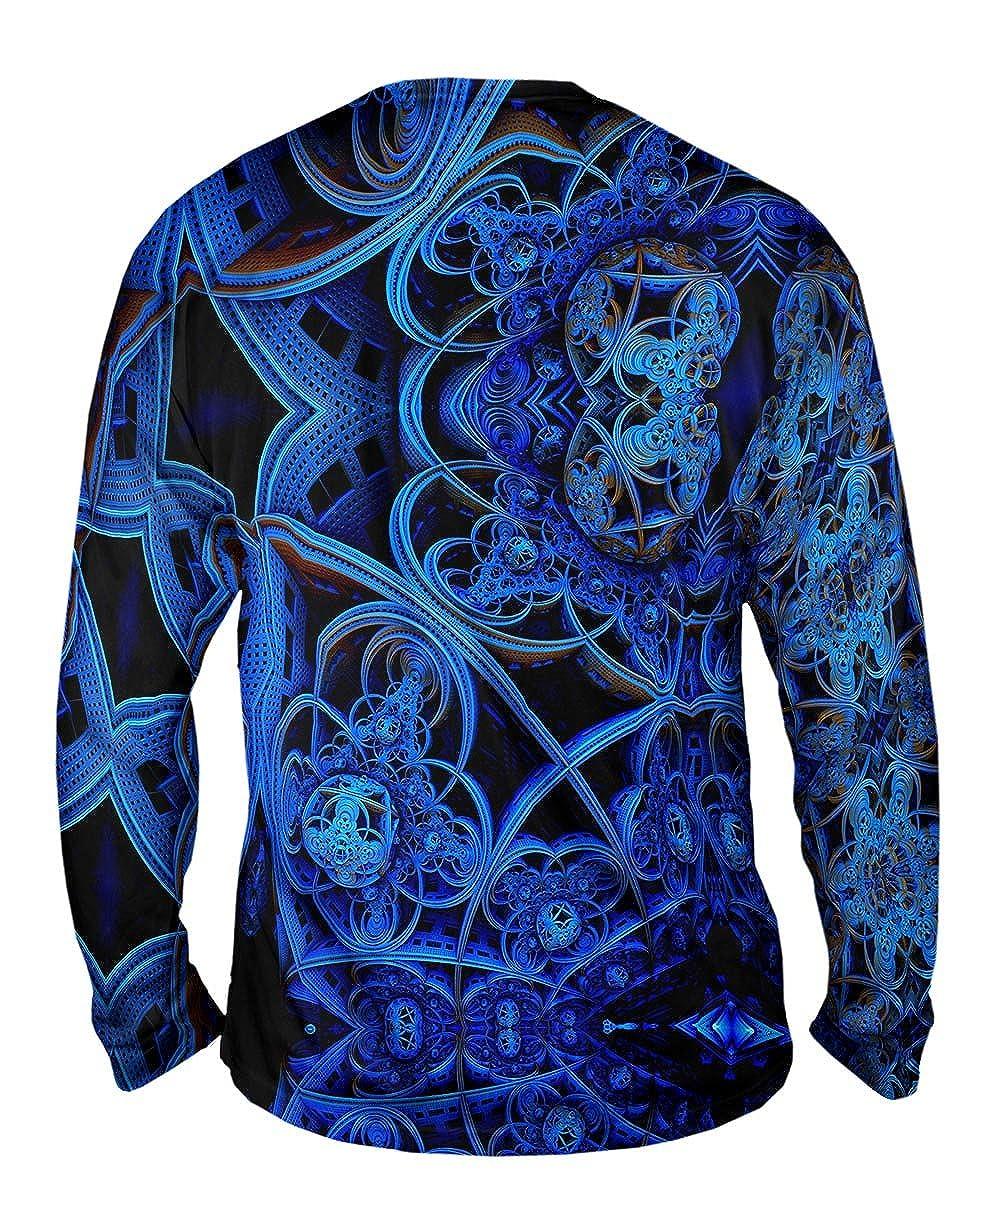 Mens Long Sleeve 3D Blue Fractal City Yizzam Tshirt